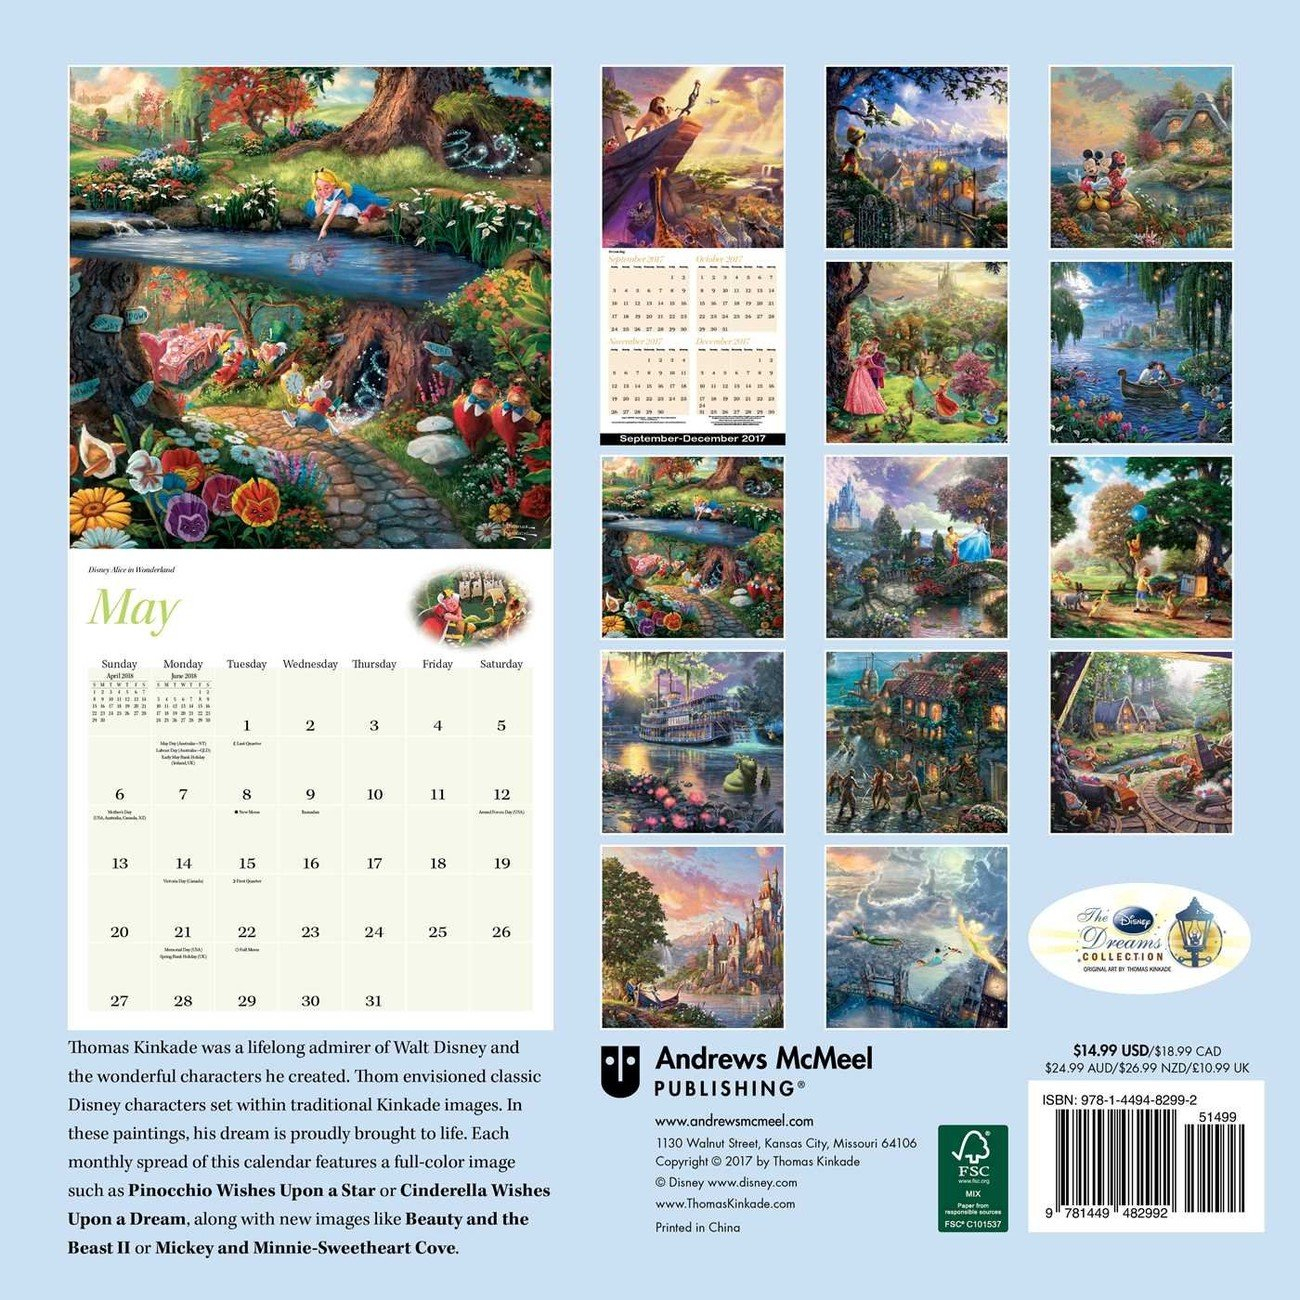 Thomas Kinkade - The Disney Dreams Collection Календарі 2020 На Calendar 2019 Thomas Kinkade